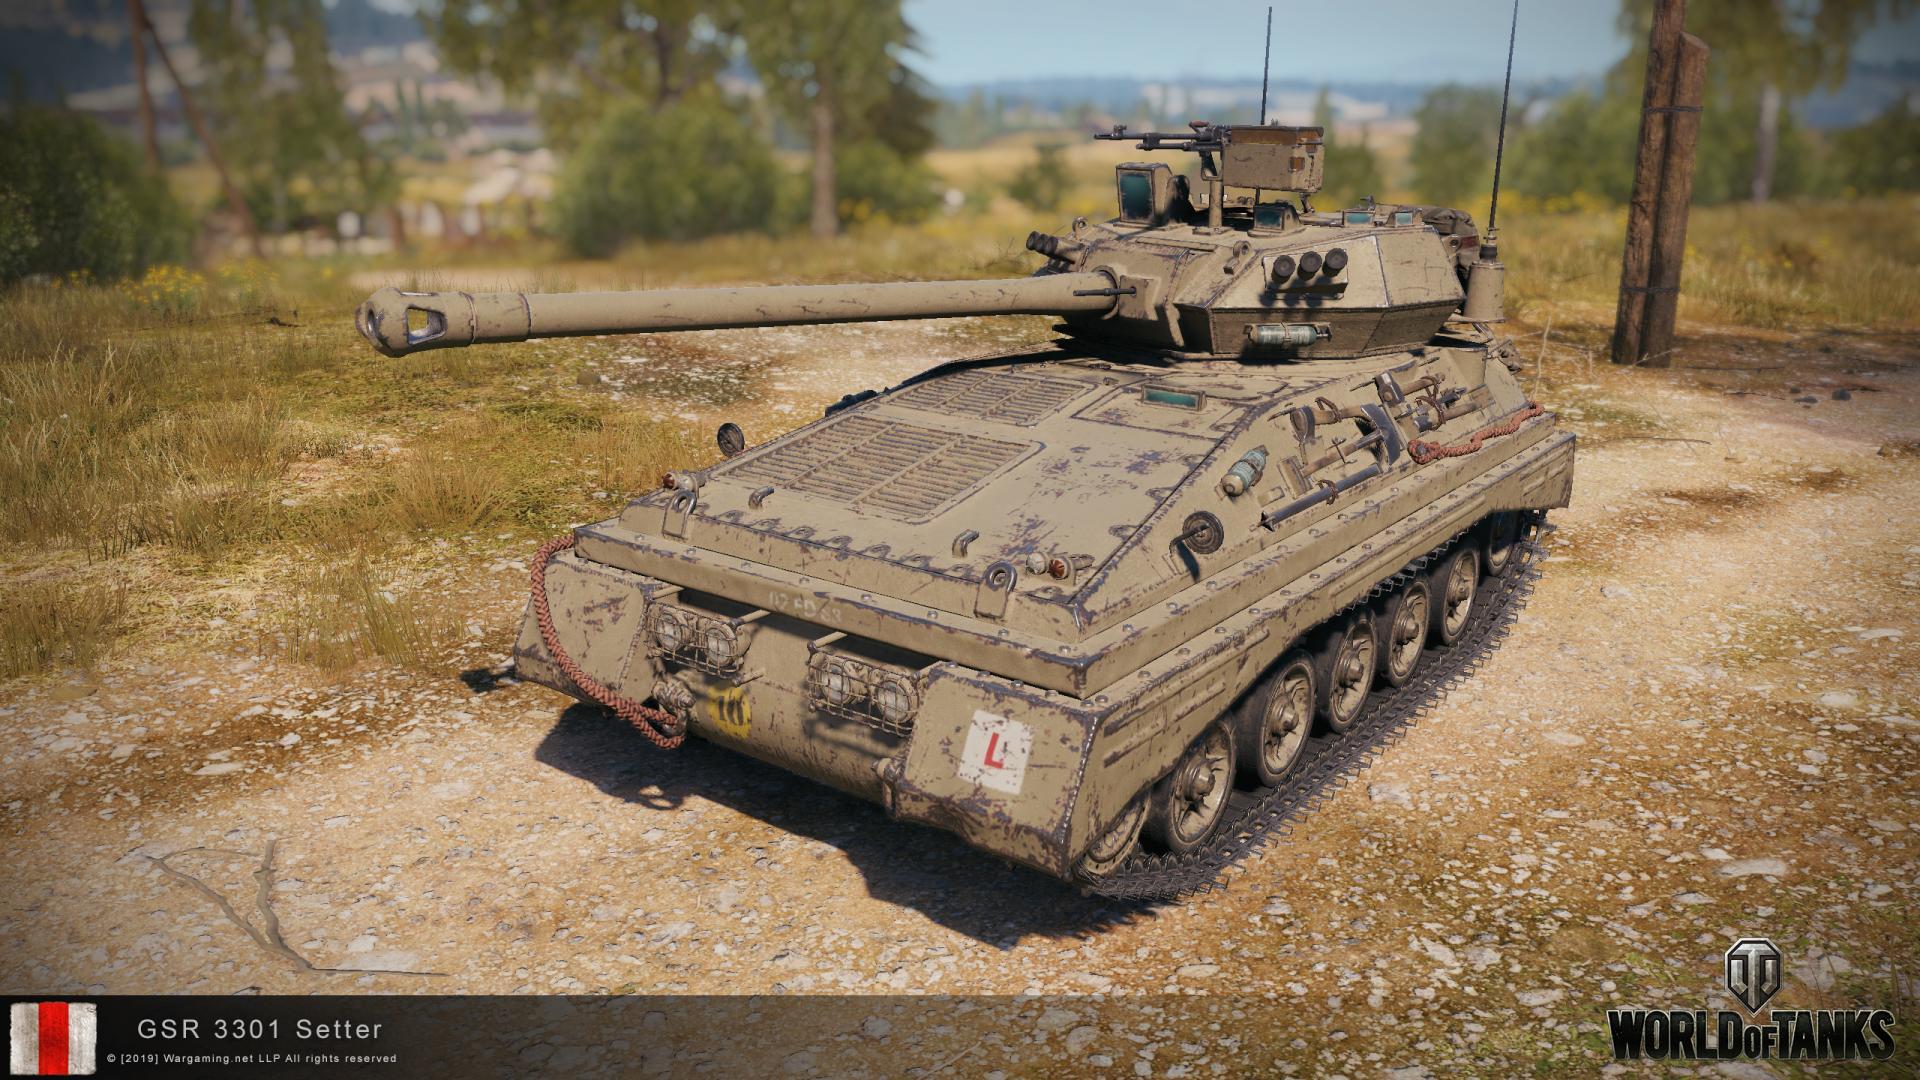 GSR 3301 Setter — британский легкий танк 7 уровня в World of Tanks